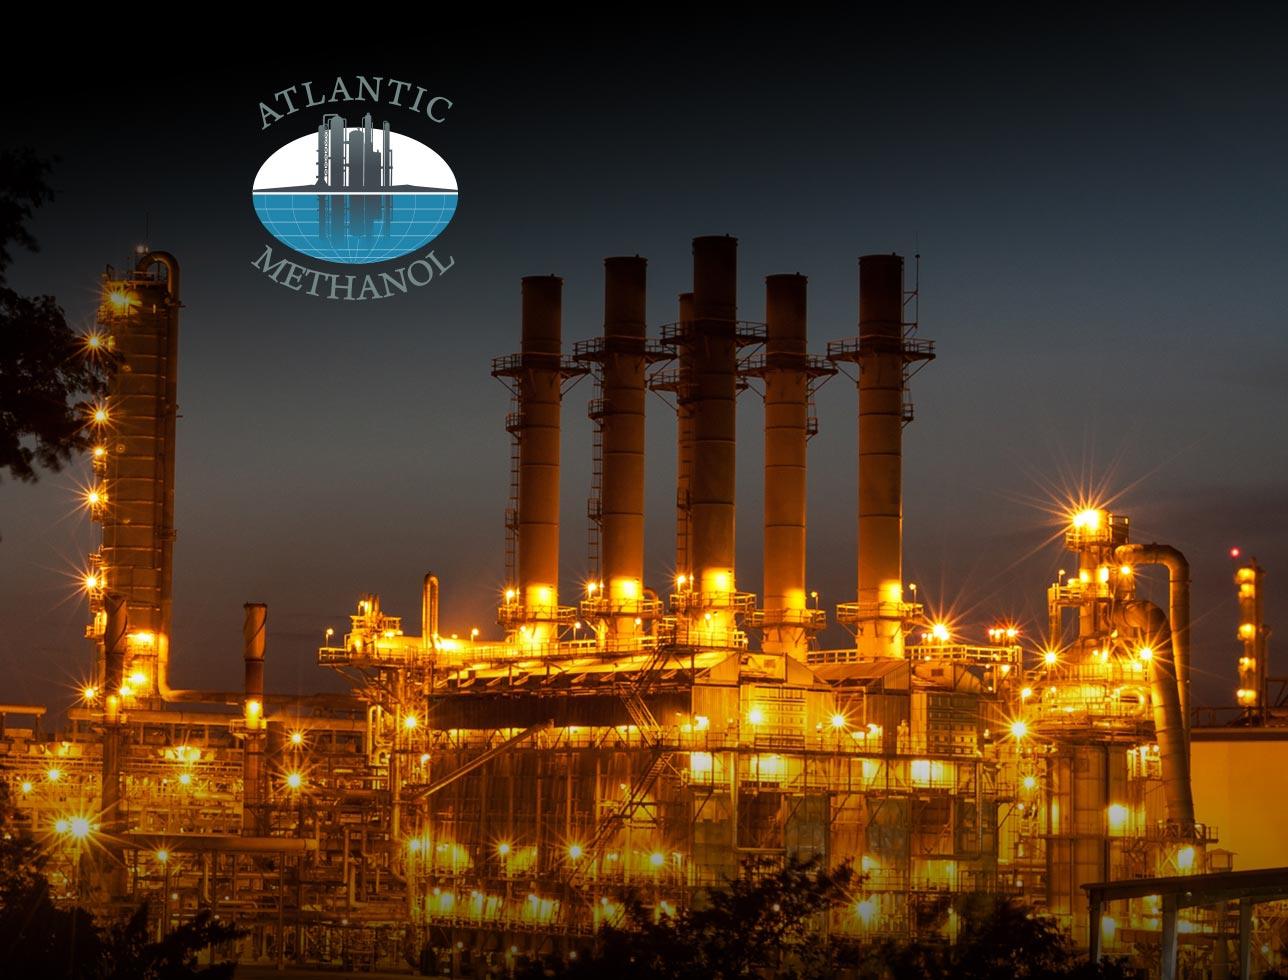 Atlantic Methanol website design